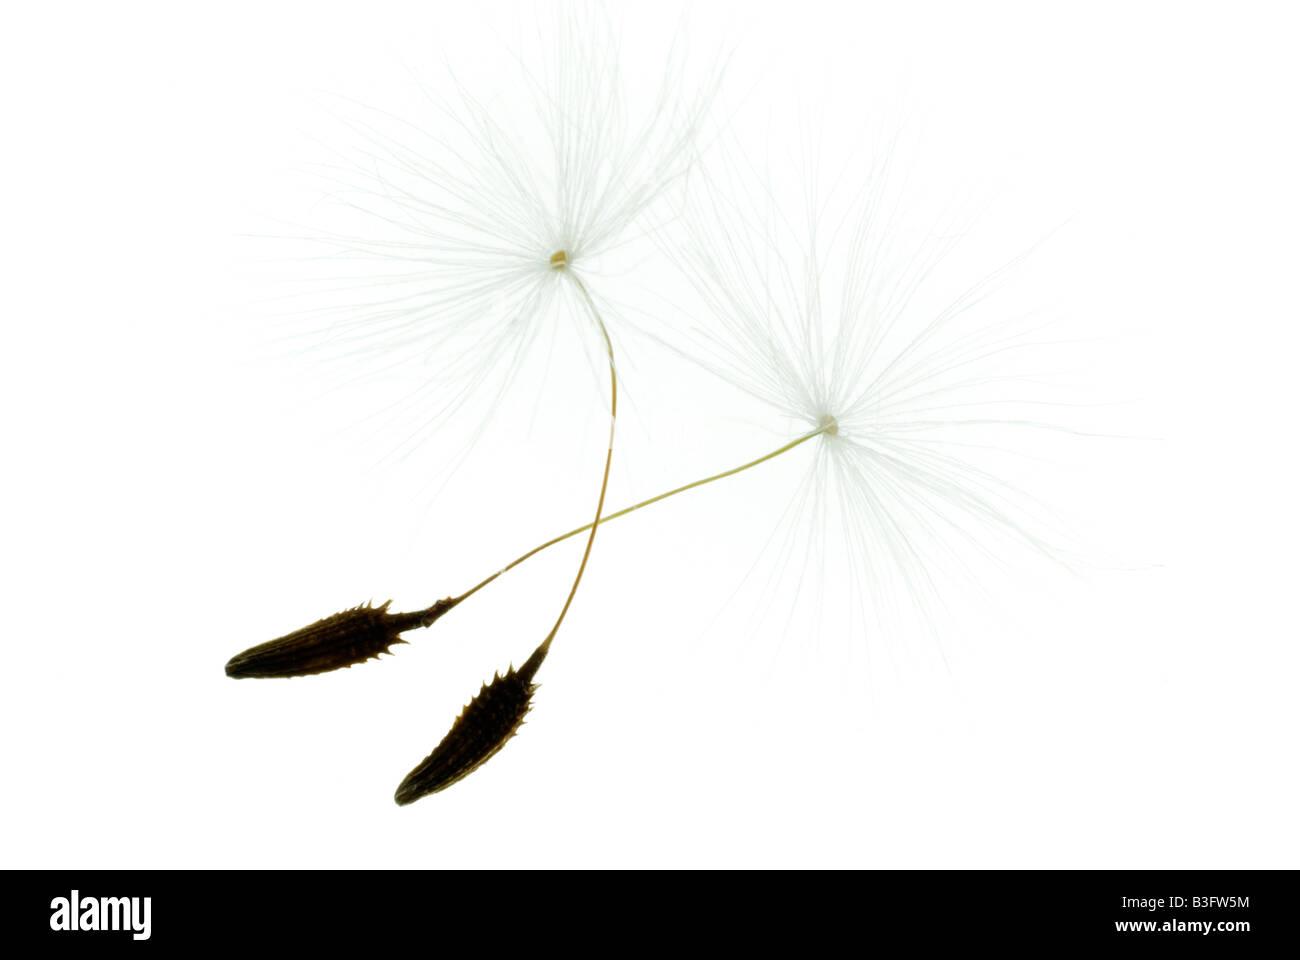 blowball pusteblume clock dandelion gewoehnlicher loewenzahn taraxacum sect ruderalia - Stock Image